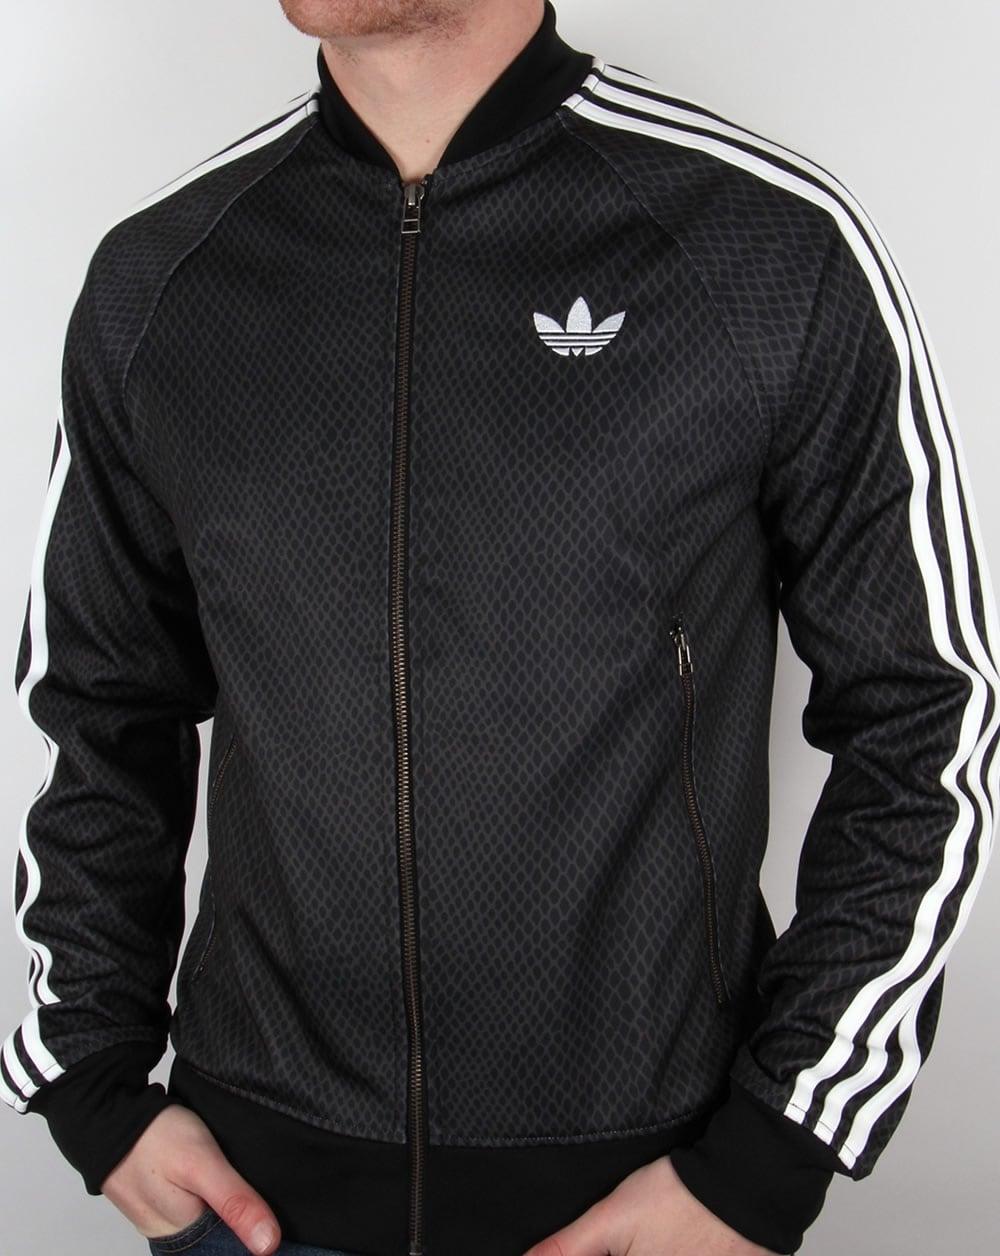 Adidas Originals Street Superstar Snake Track Top Black